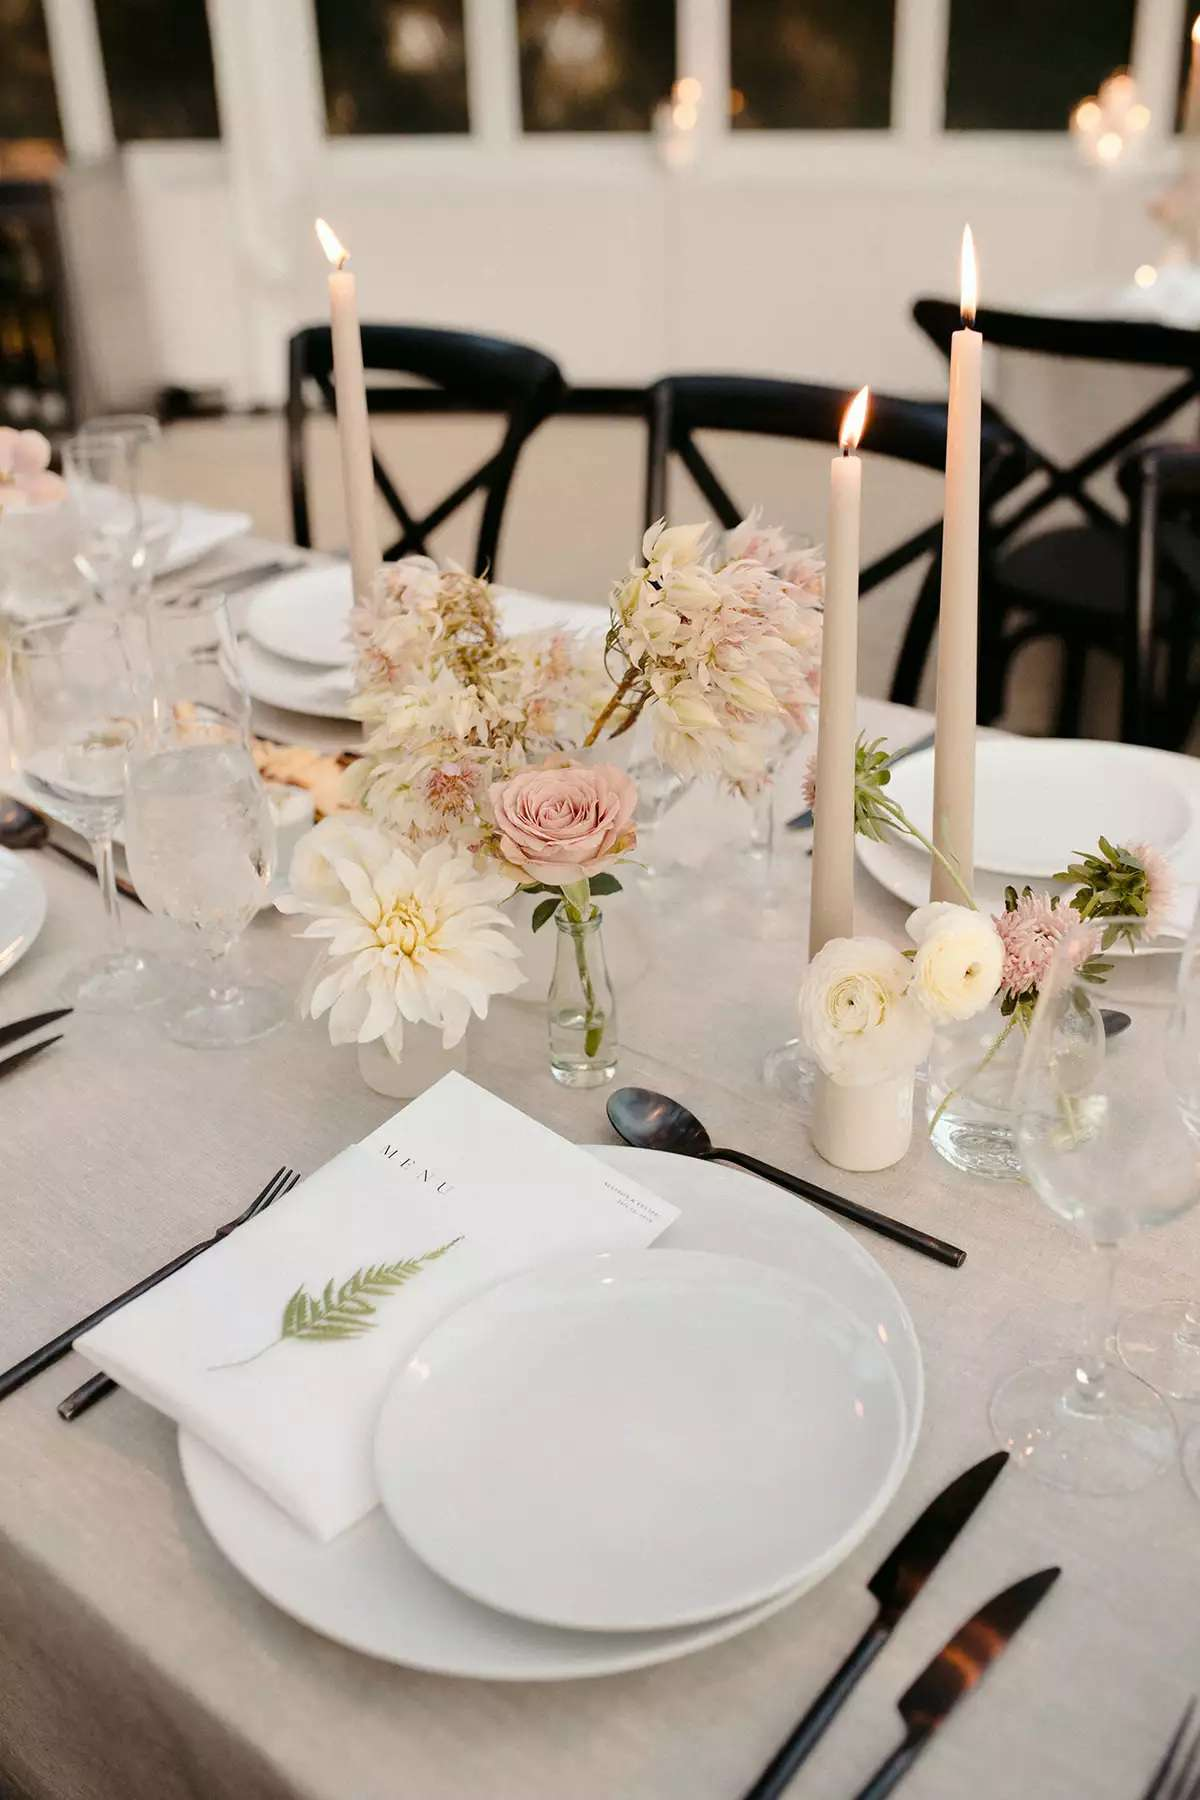 bud vase centerpieces with dahlias